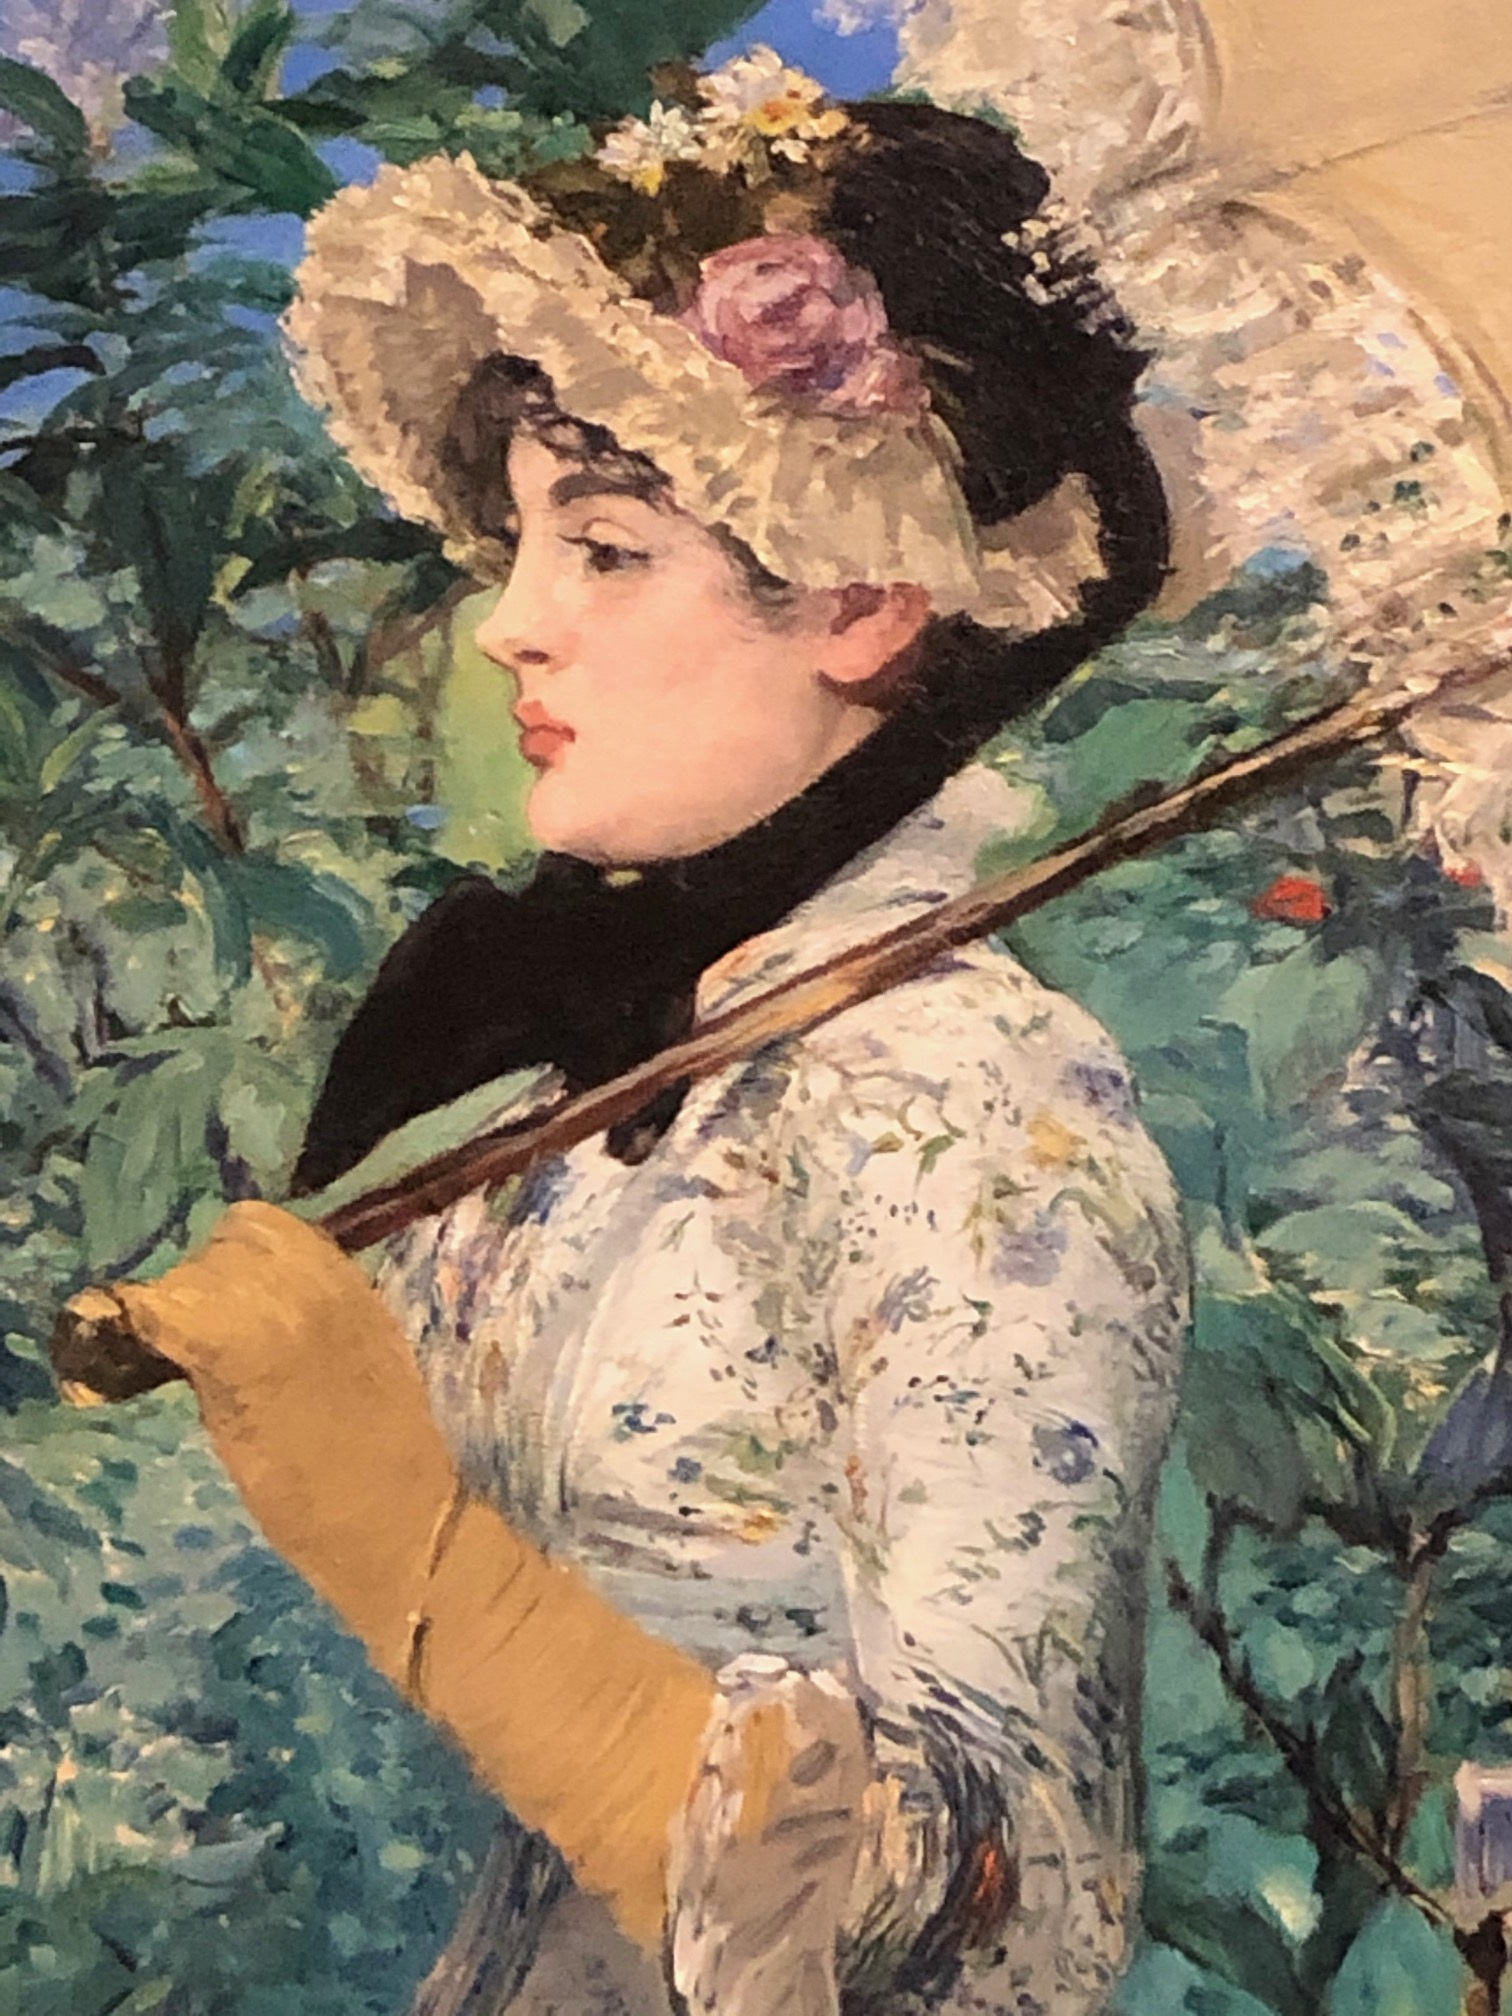 Modemuze. Nina Groeskamp, Americana, Los Angeles, The J. Paul Getty Museum, Edouard Manet, Modern Beauty, mode, kunst; Édouard Manet, Jeanne (Spring), 1881, The J. Paul Getty Museum, Fotograaf: Nina Groeskamp.